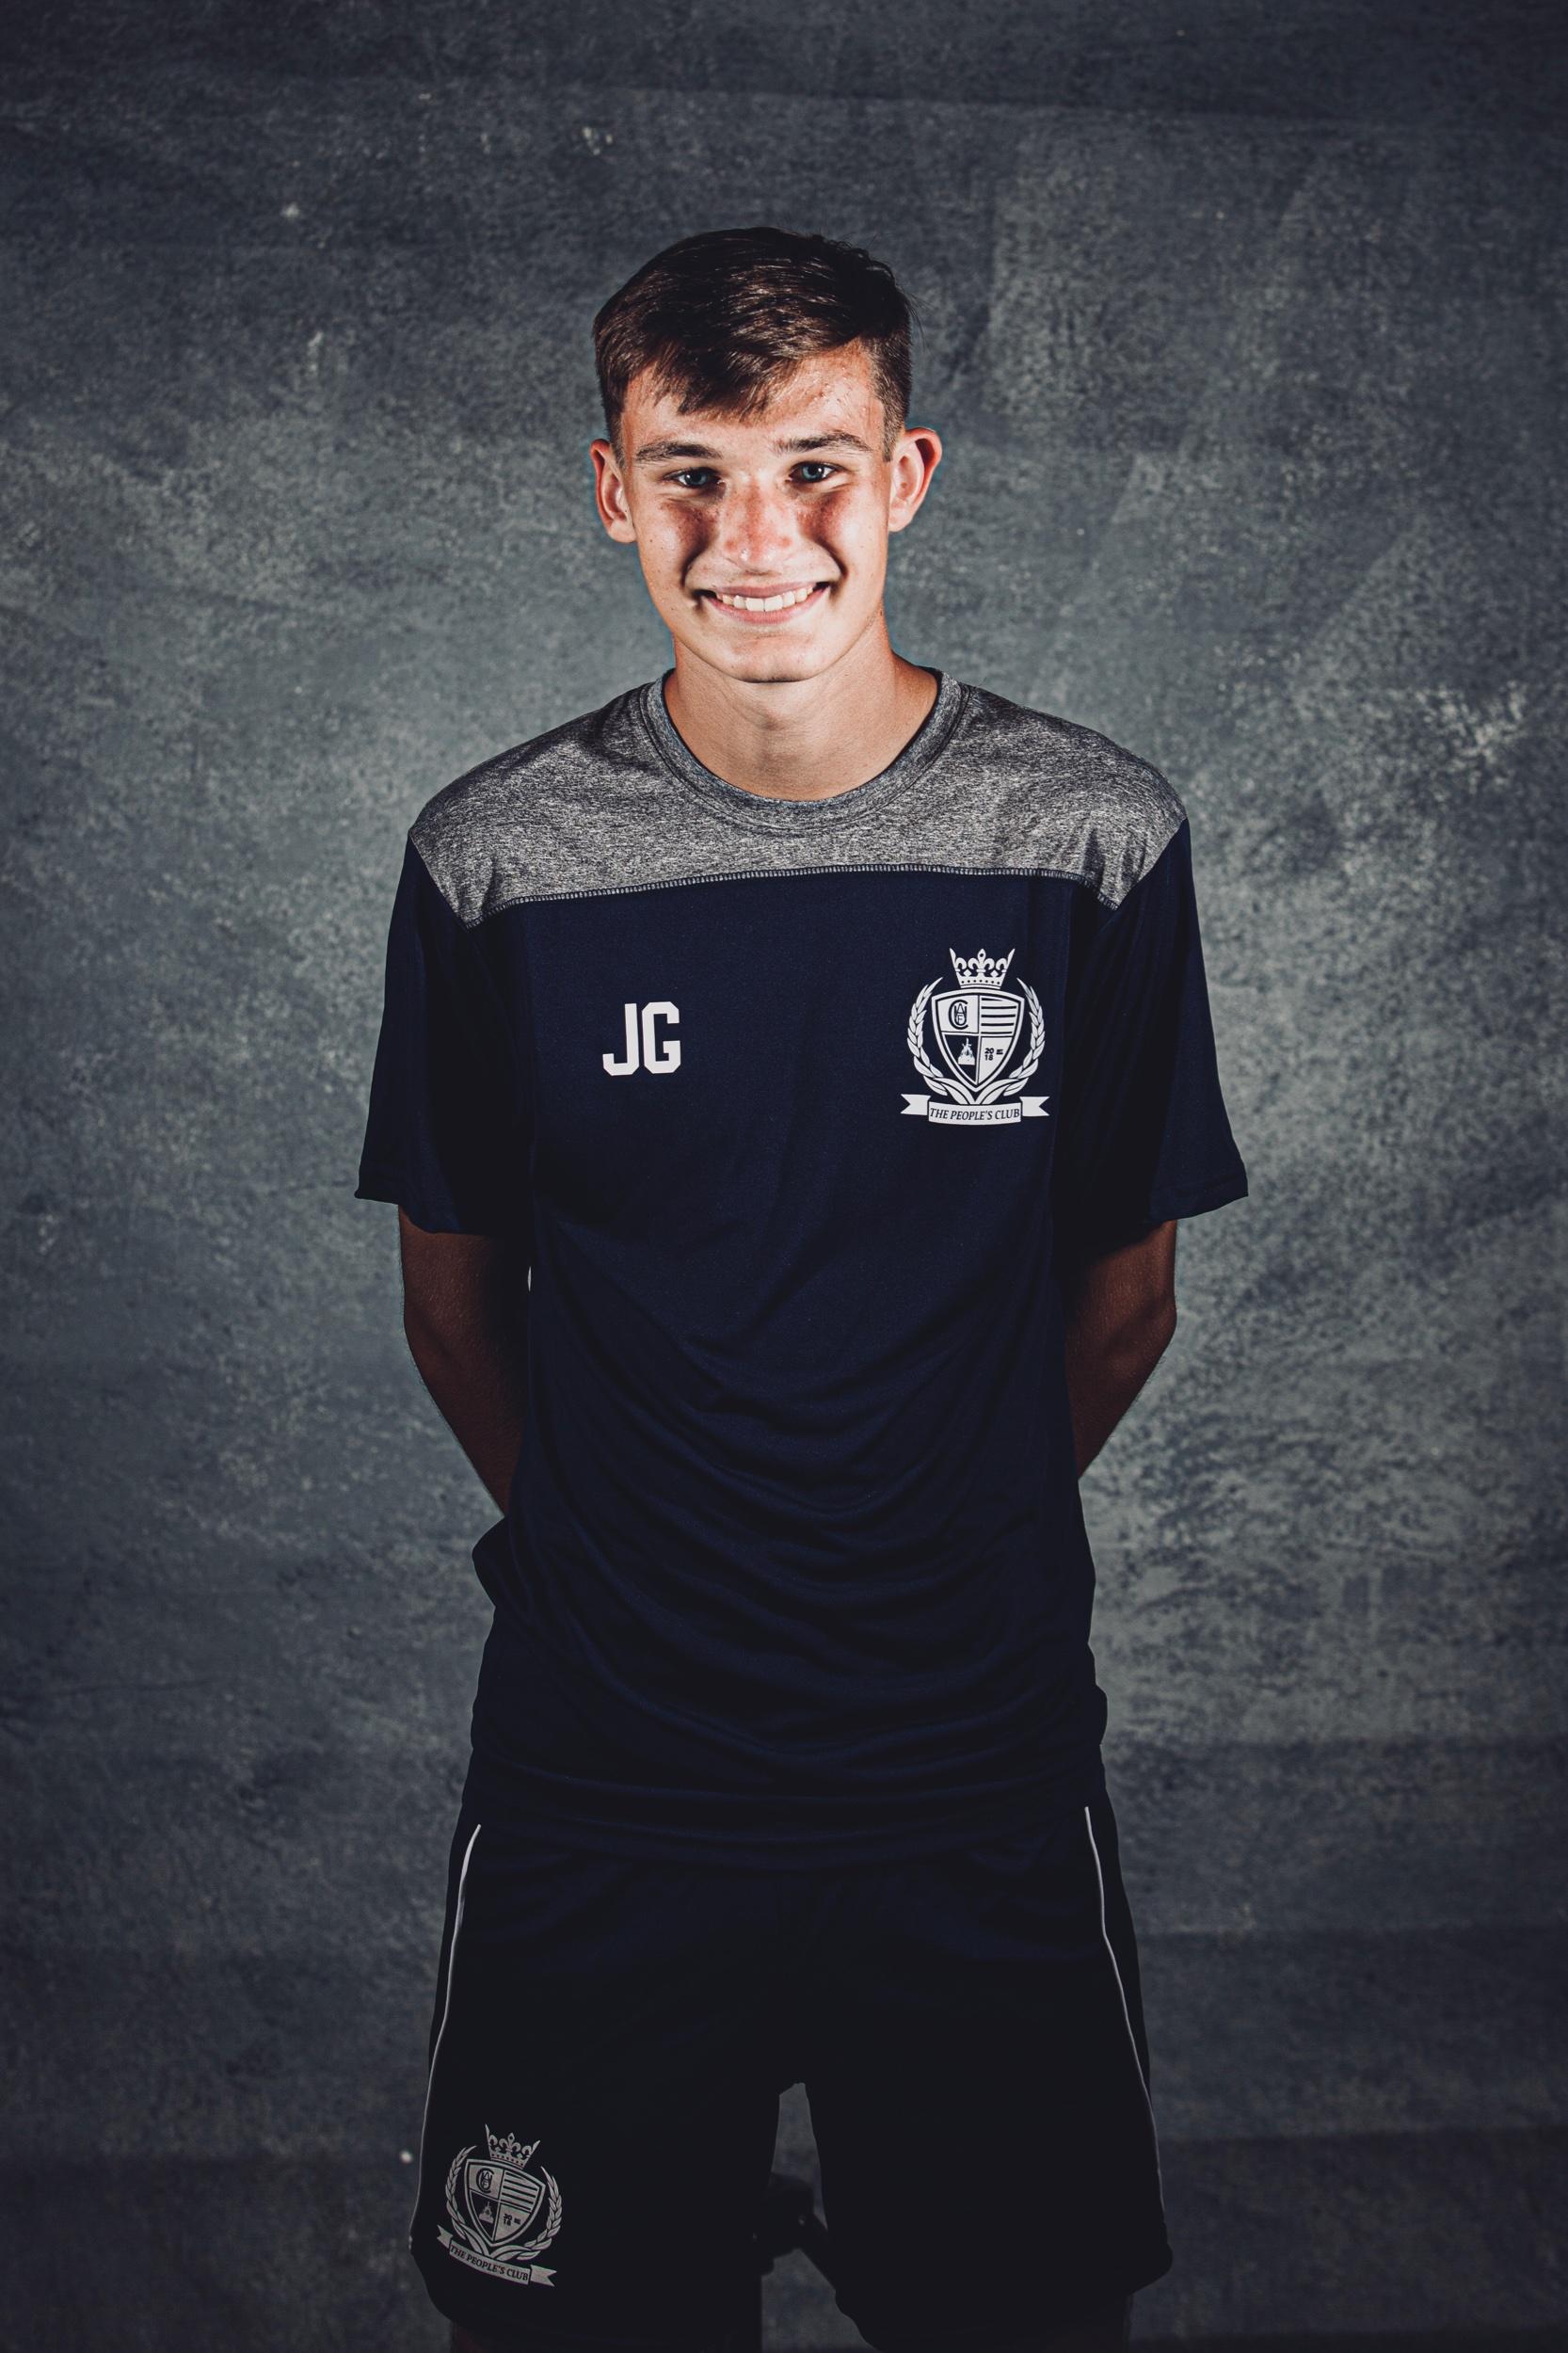 #19 - JACOBGIER